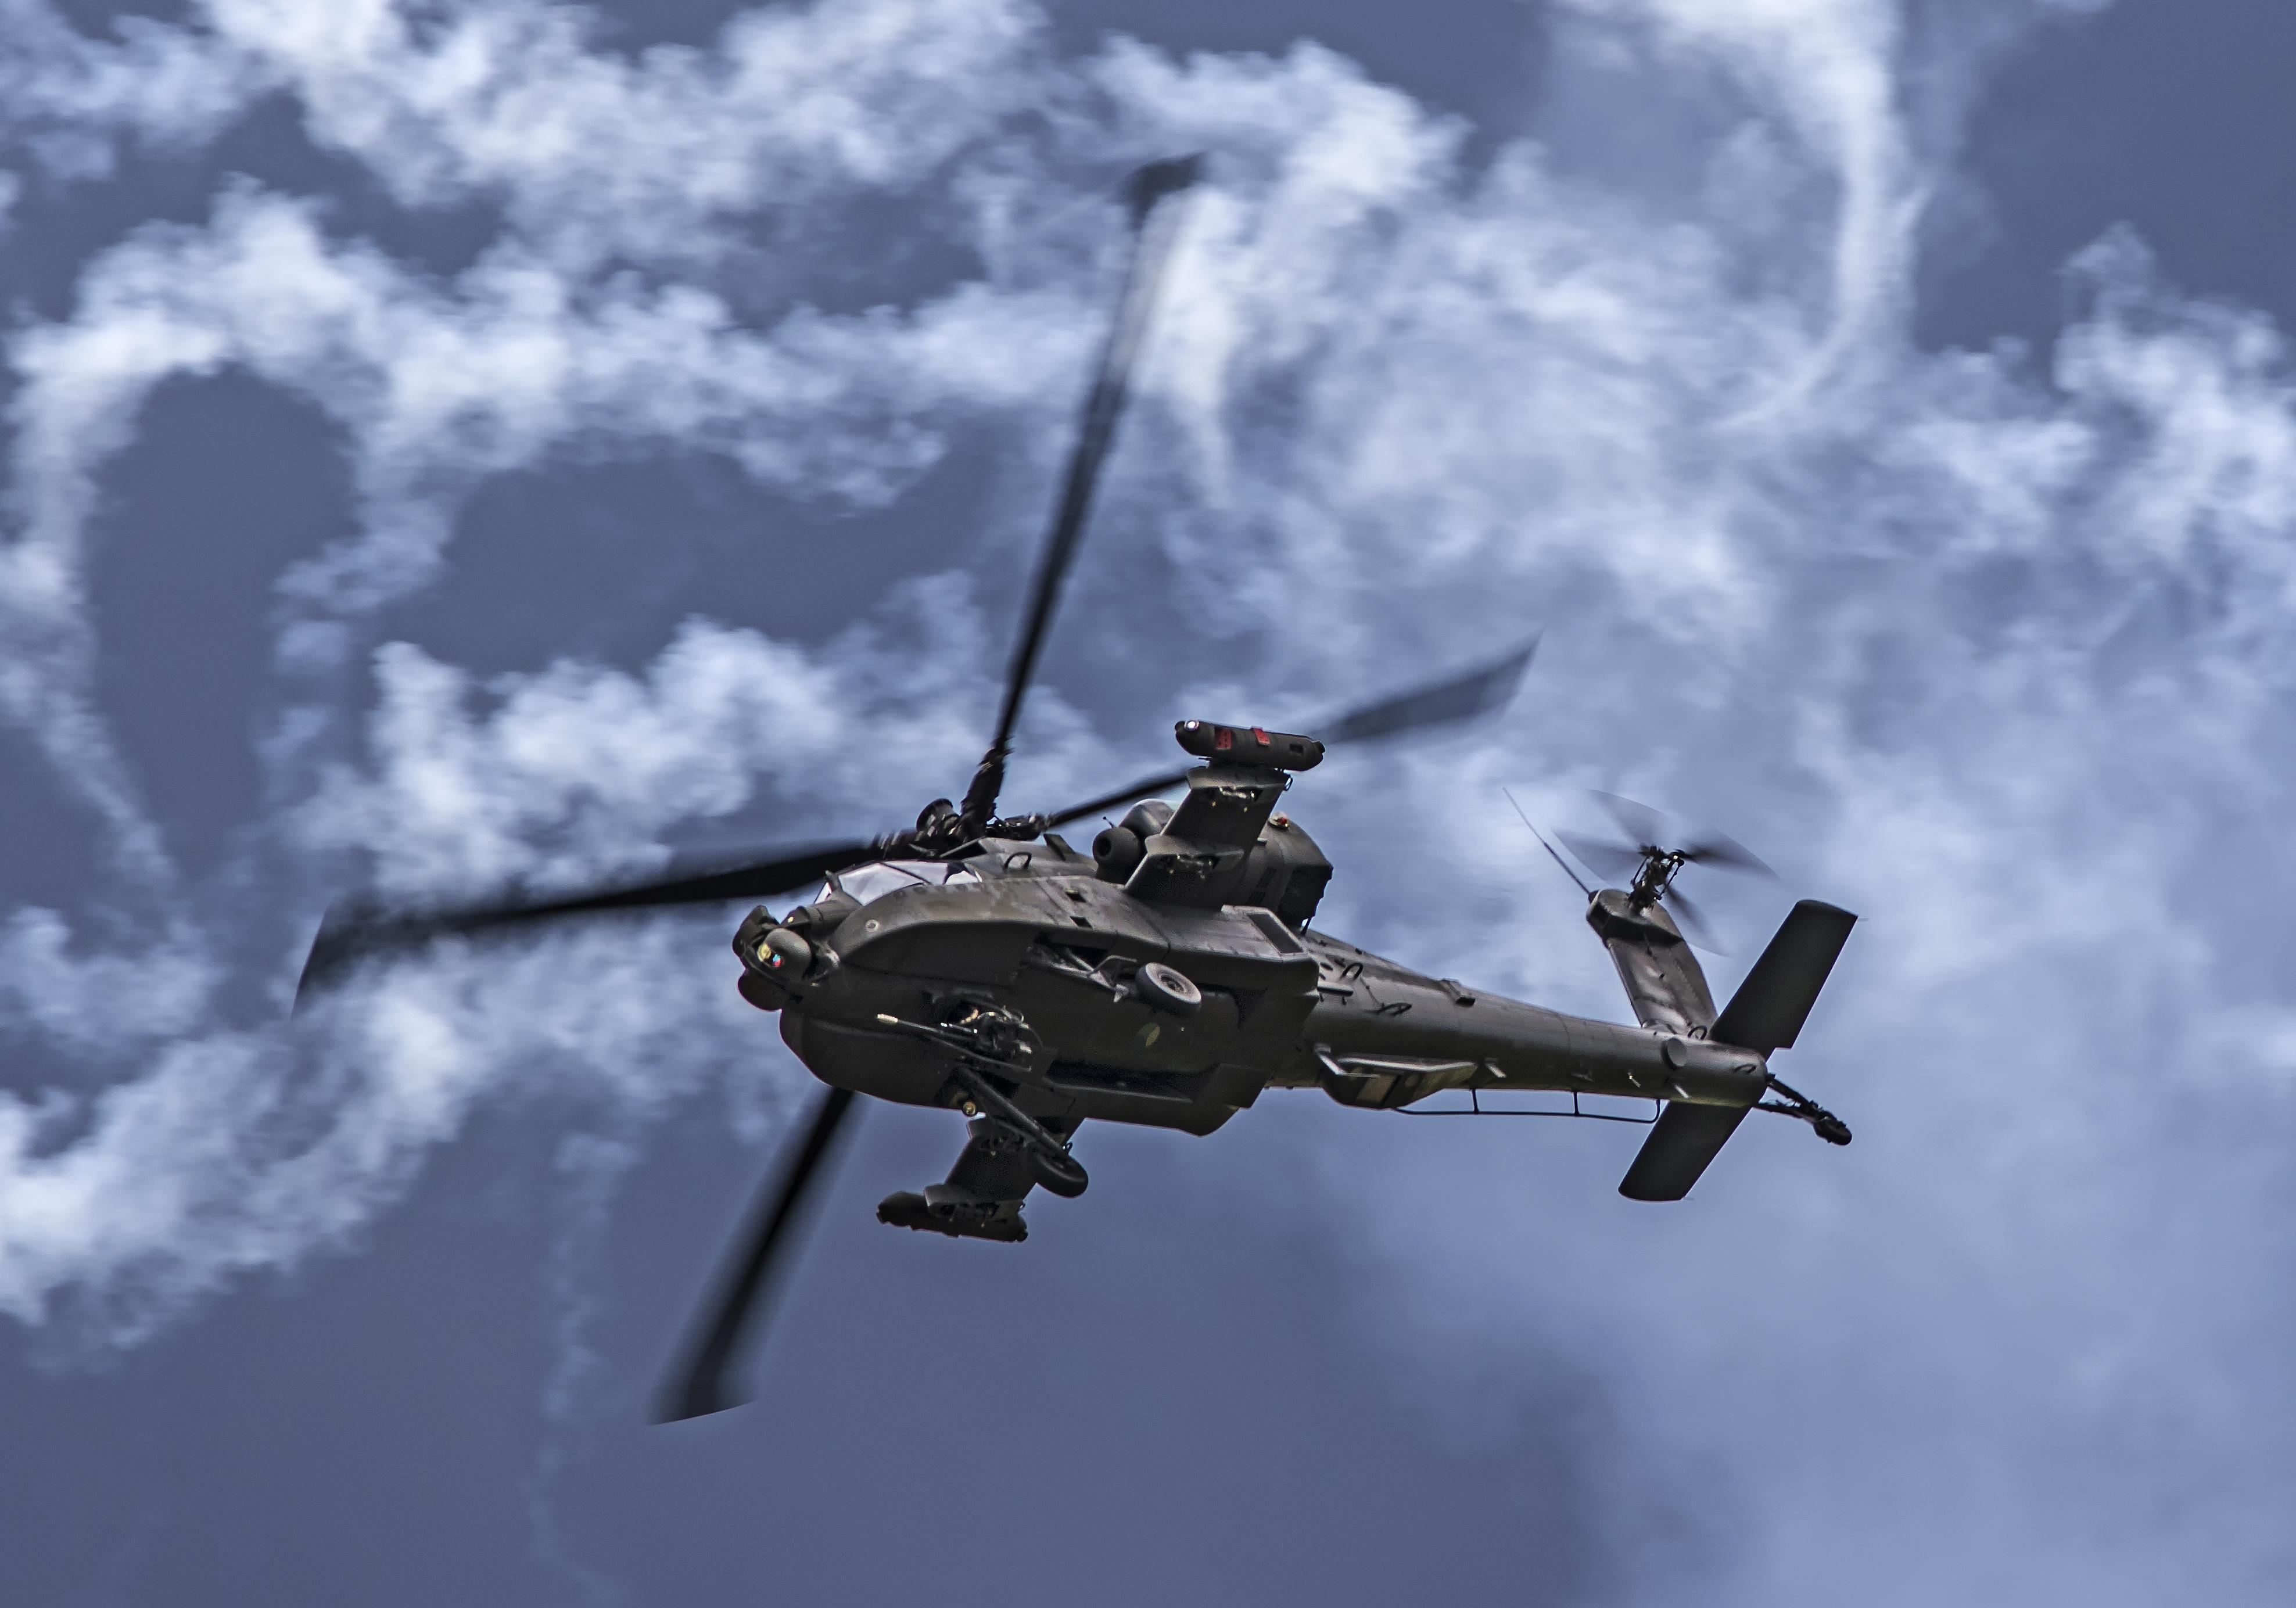 Military Helicopter 4k Hd Desktop Wallpaper For 4k Ultra: Boeing Ah-64 Apache 4k Ultra HD Wallpaper